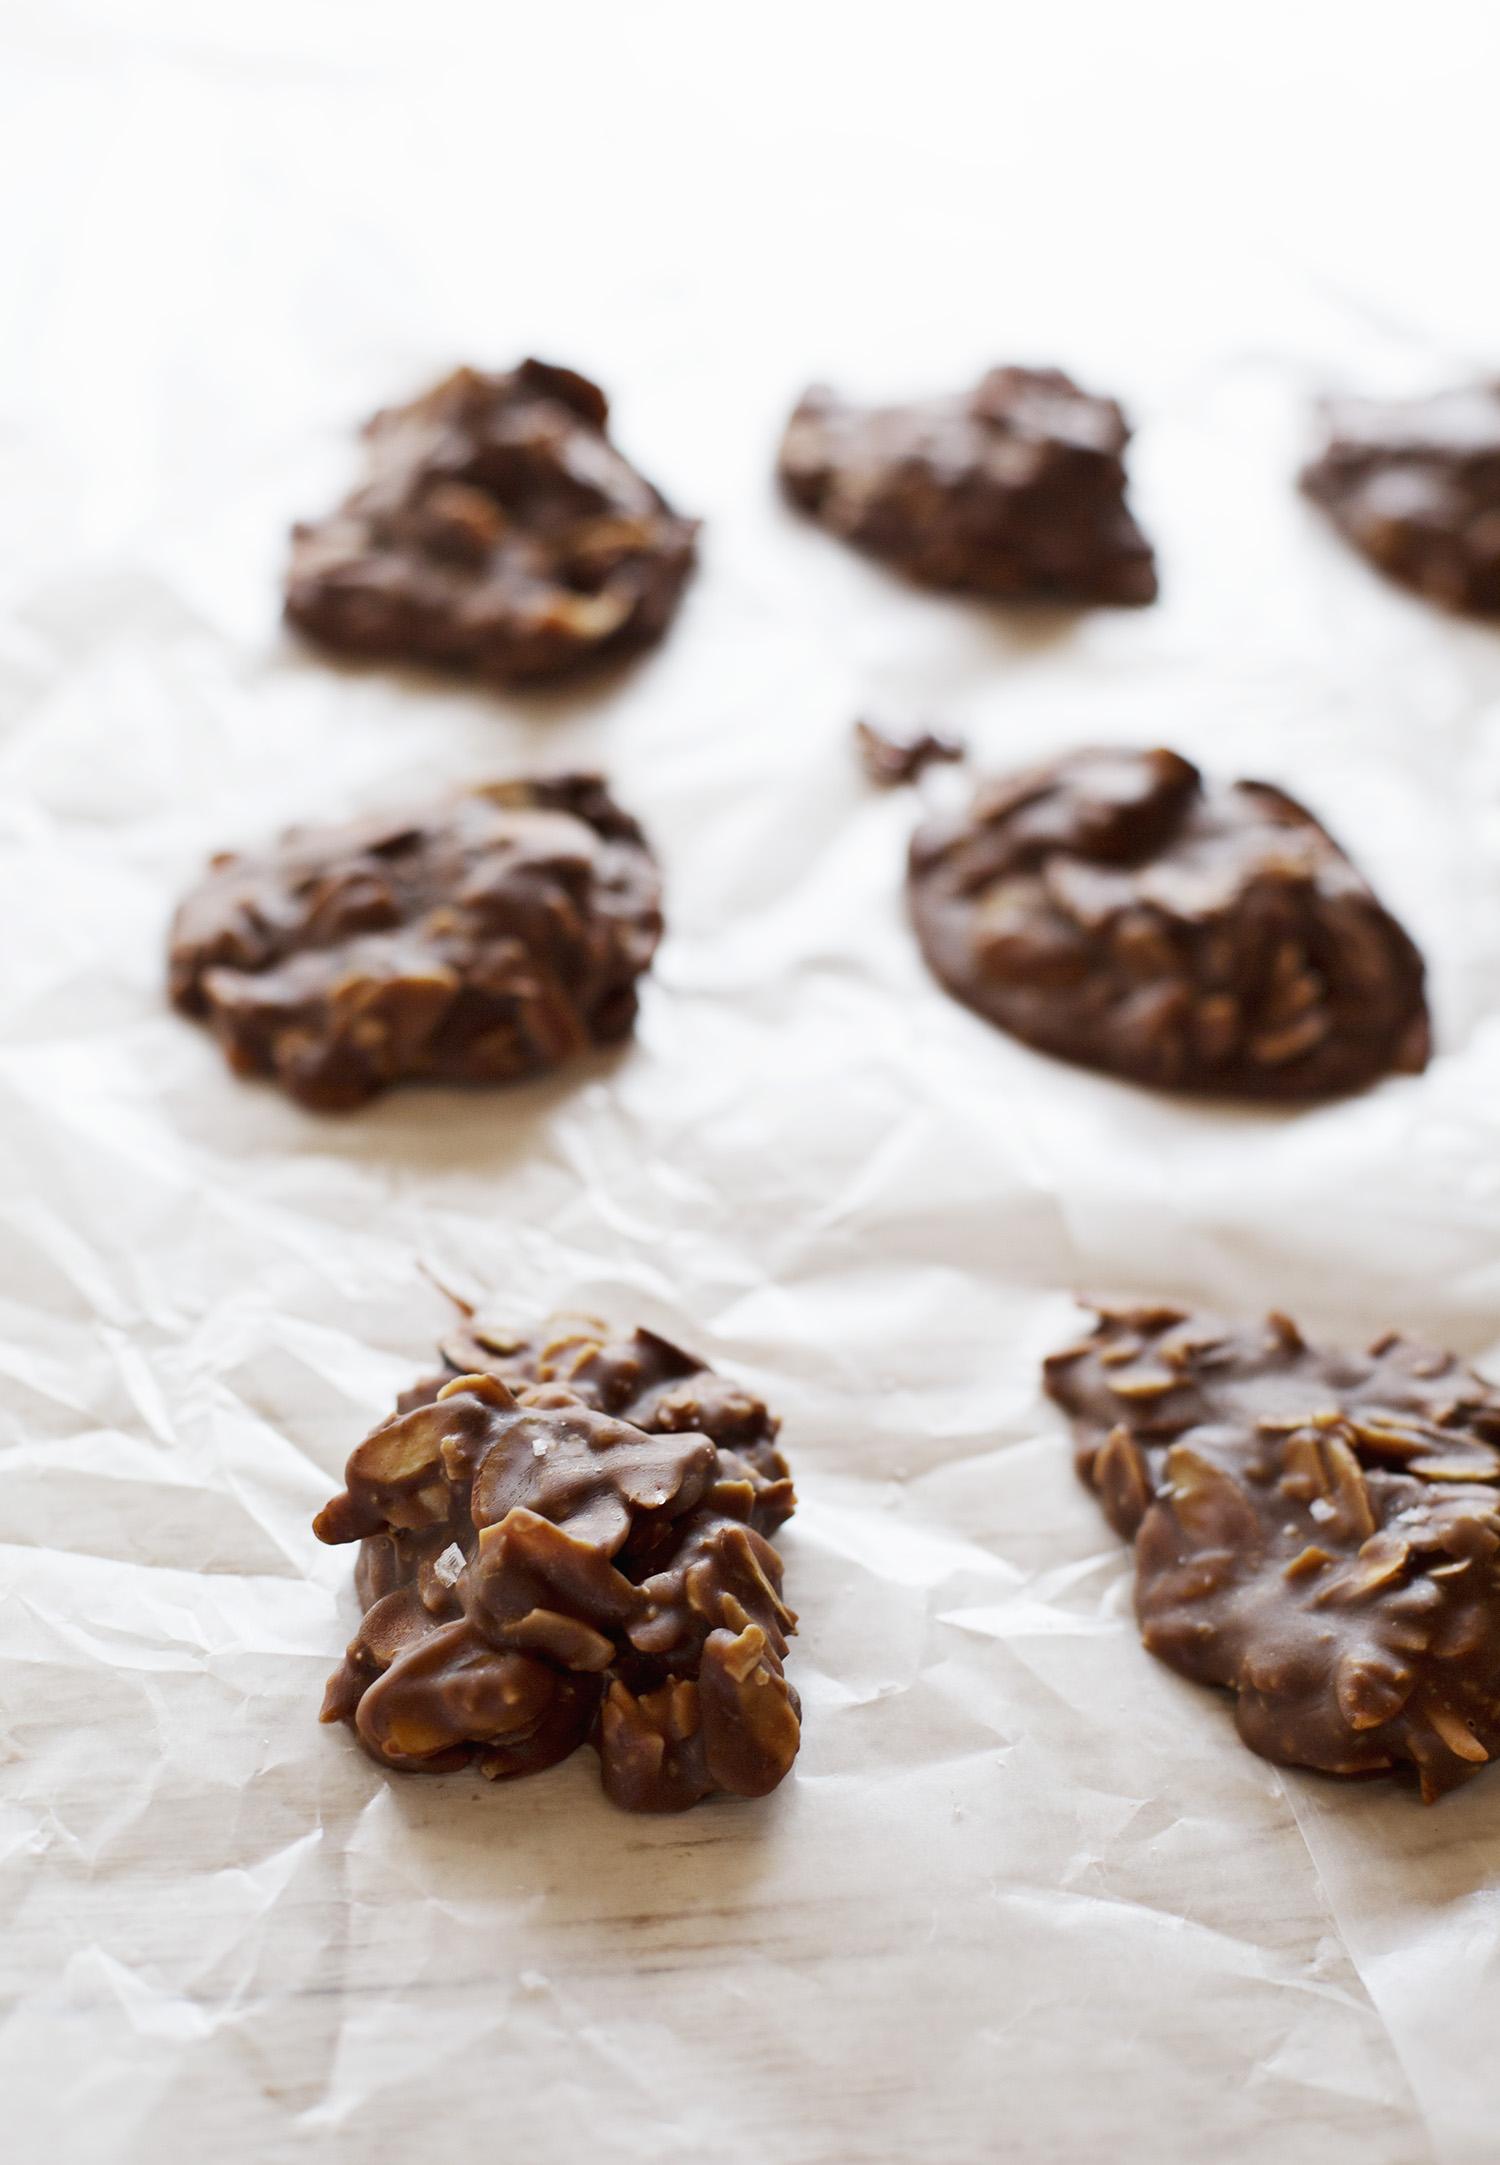 Chocolate No Grain No Bake Cookies (via abeautifulmess.com)